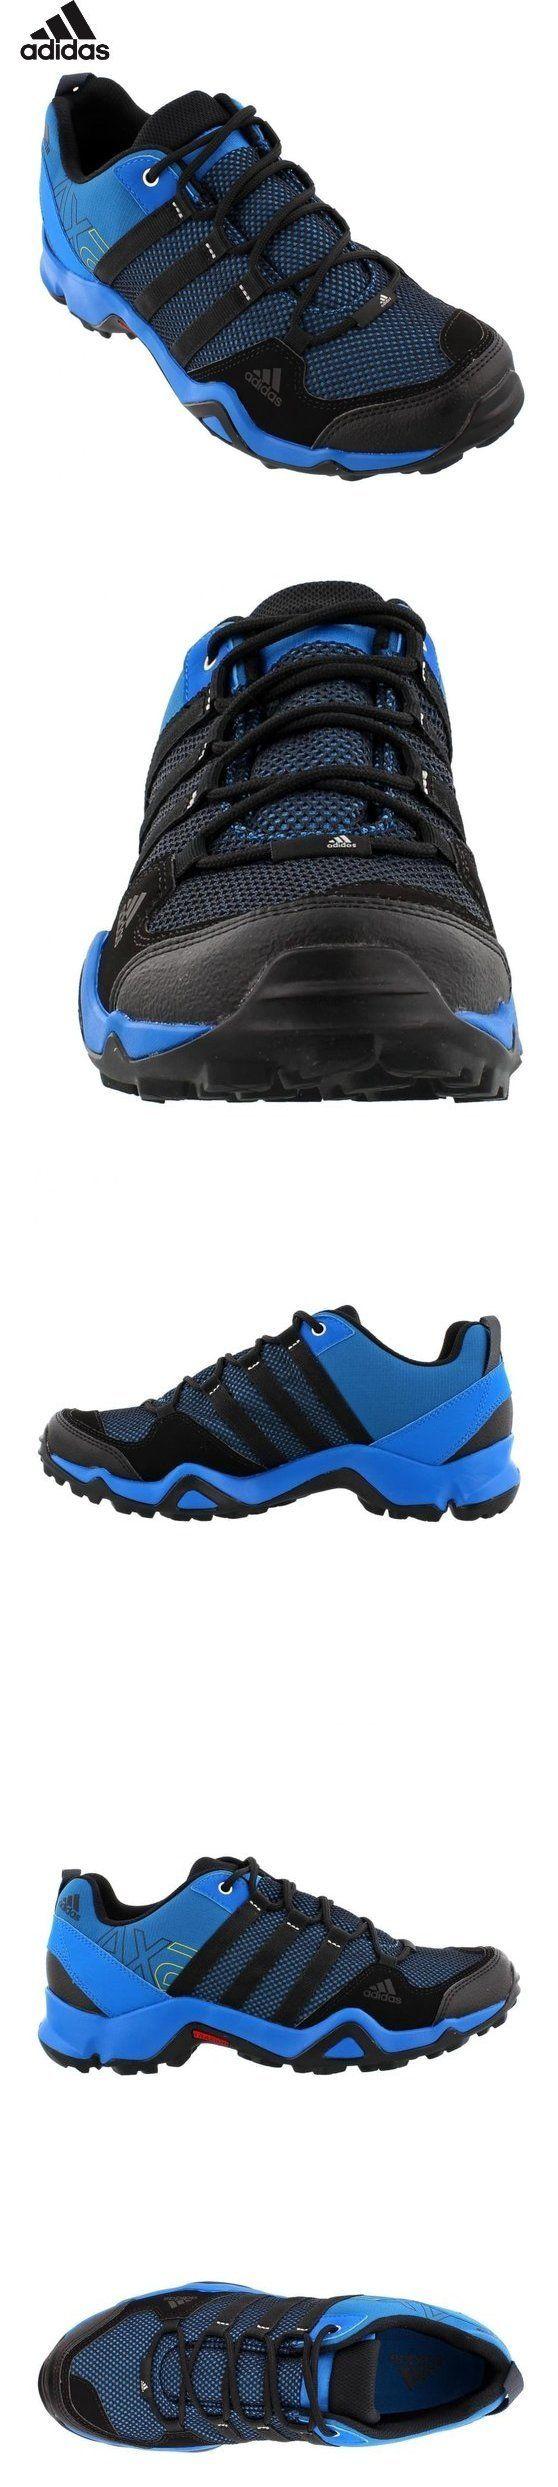 $84.99 - Adidas Sport Performance Women's Terrex Solo Hiking Sneakers, Orange Textile, Mesh, Rubber, 10 M